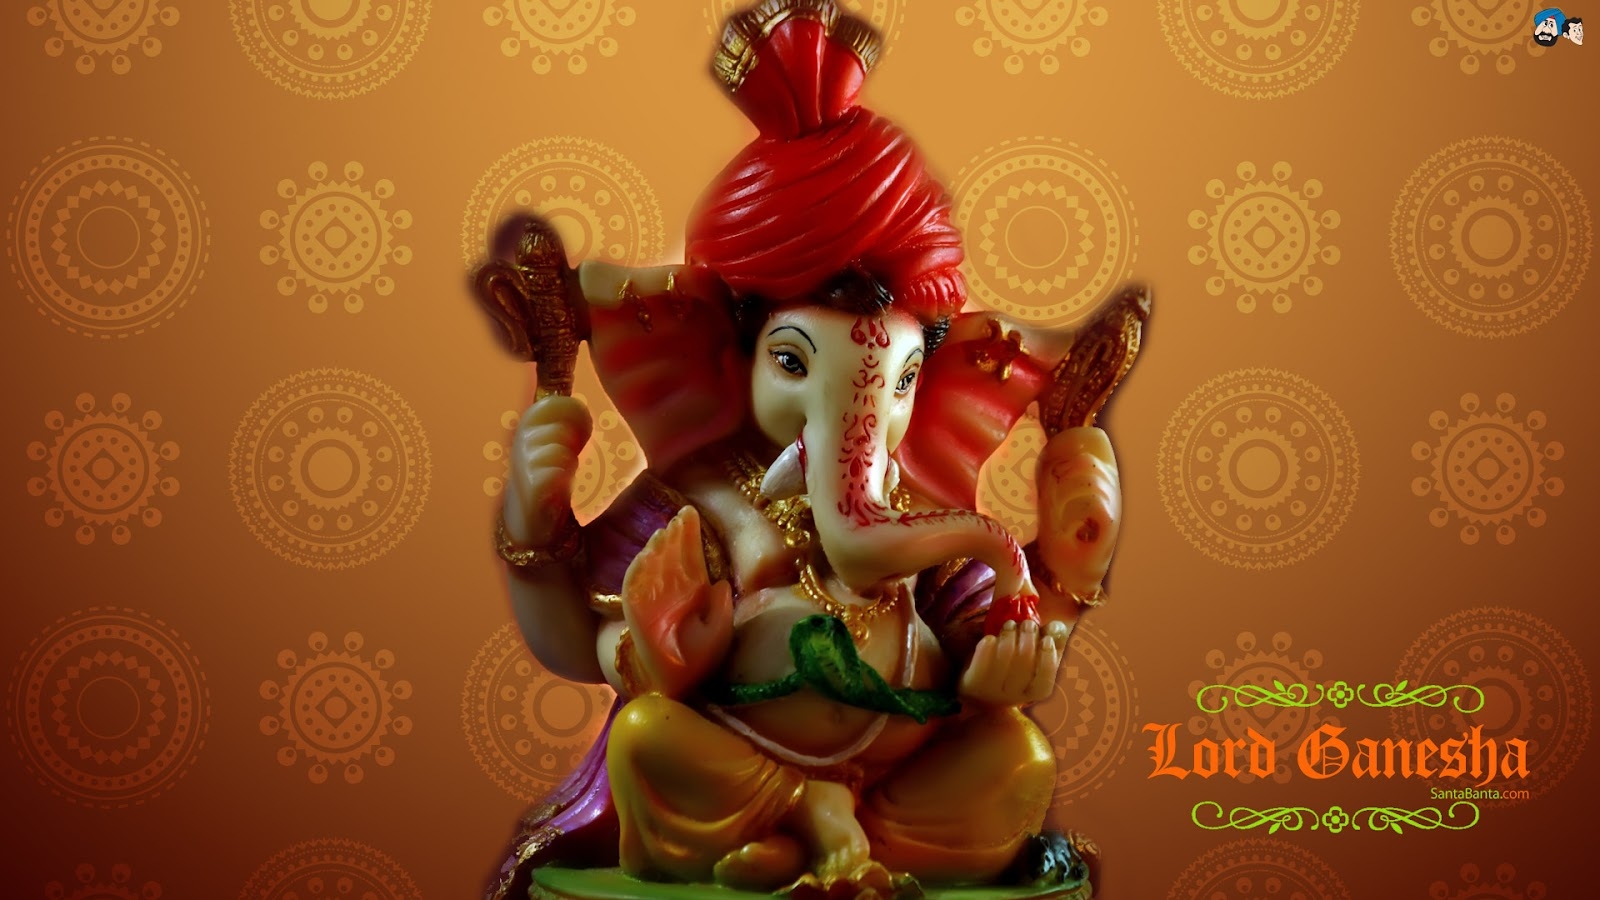 Lord Ganesha Latest Hd Images Free Downloads: HD WALLPAPER: Best HD God Wallpaper(High Definition)